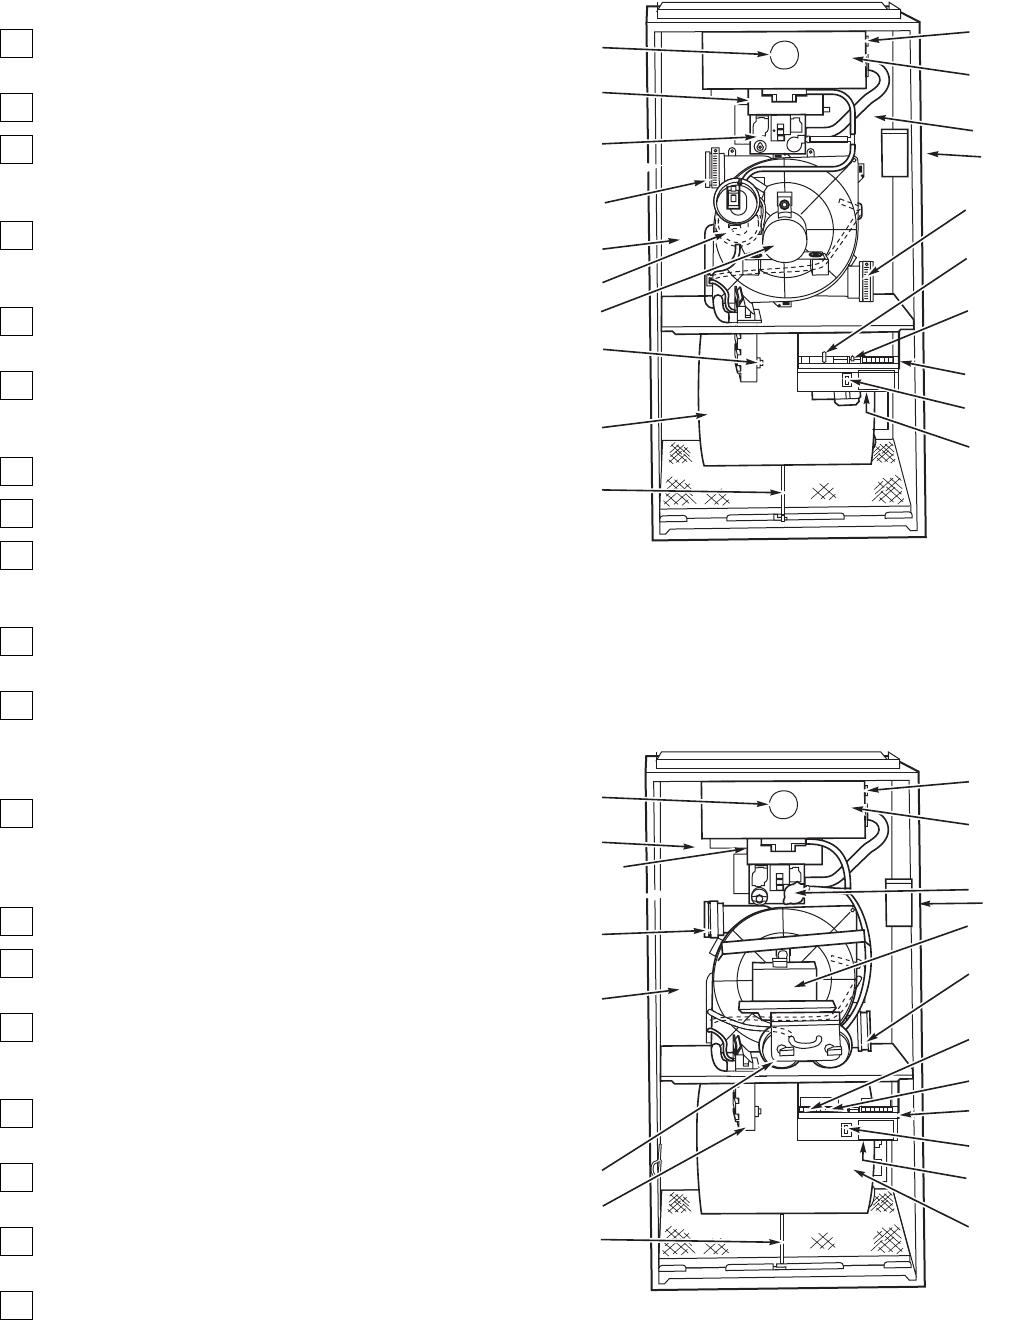 Bryant furnace parts diagram bryant plus 90 blower motor Bryant furnace blower motor replacement